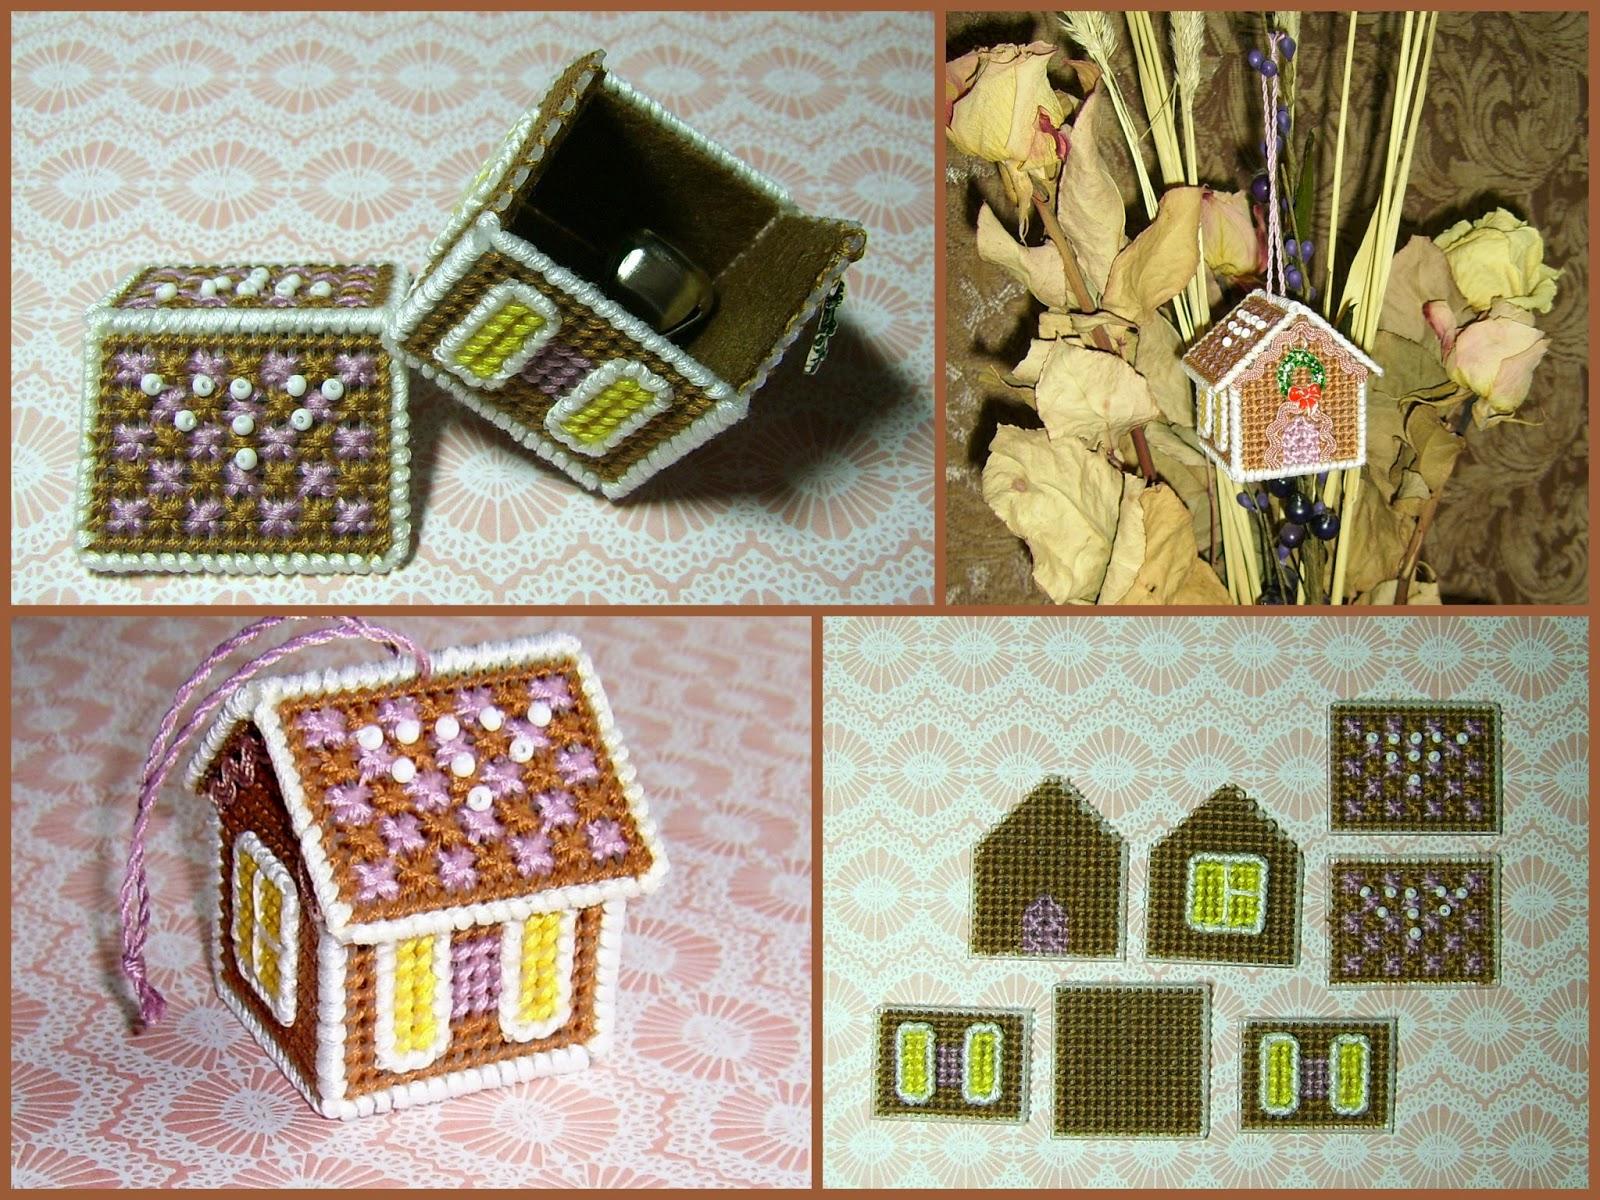 схема вышивки пряничного домика зд